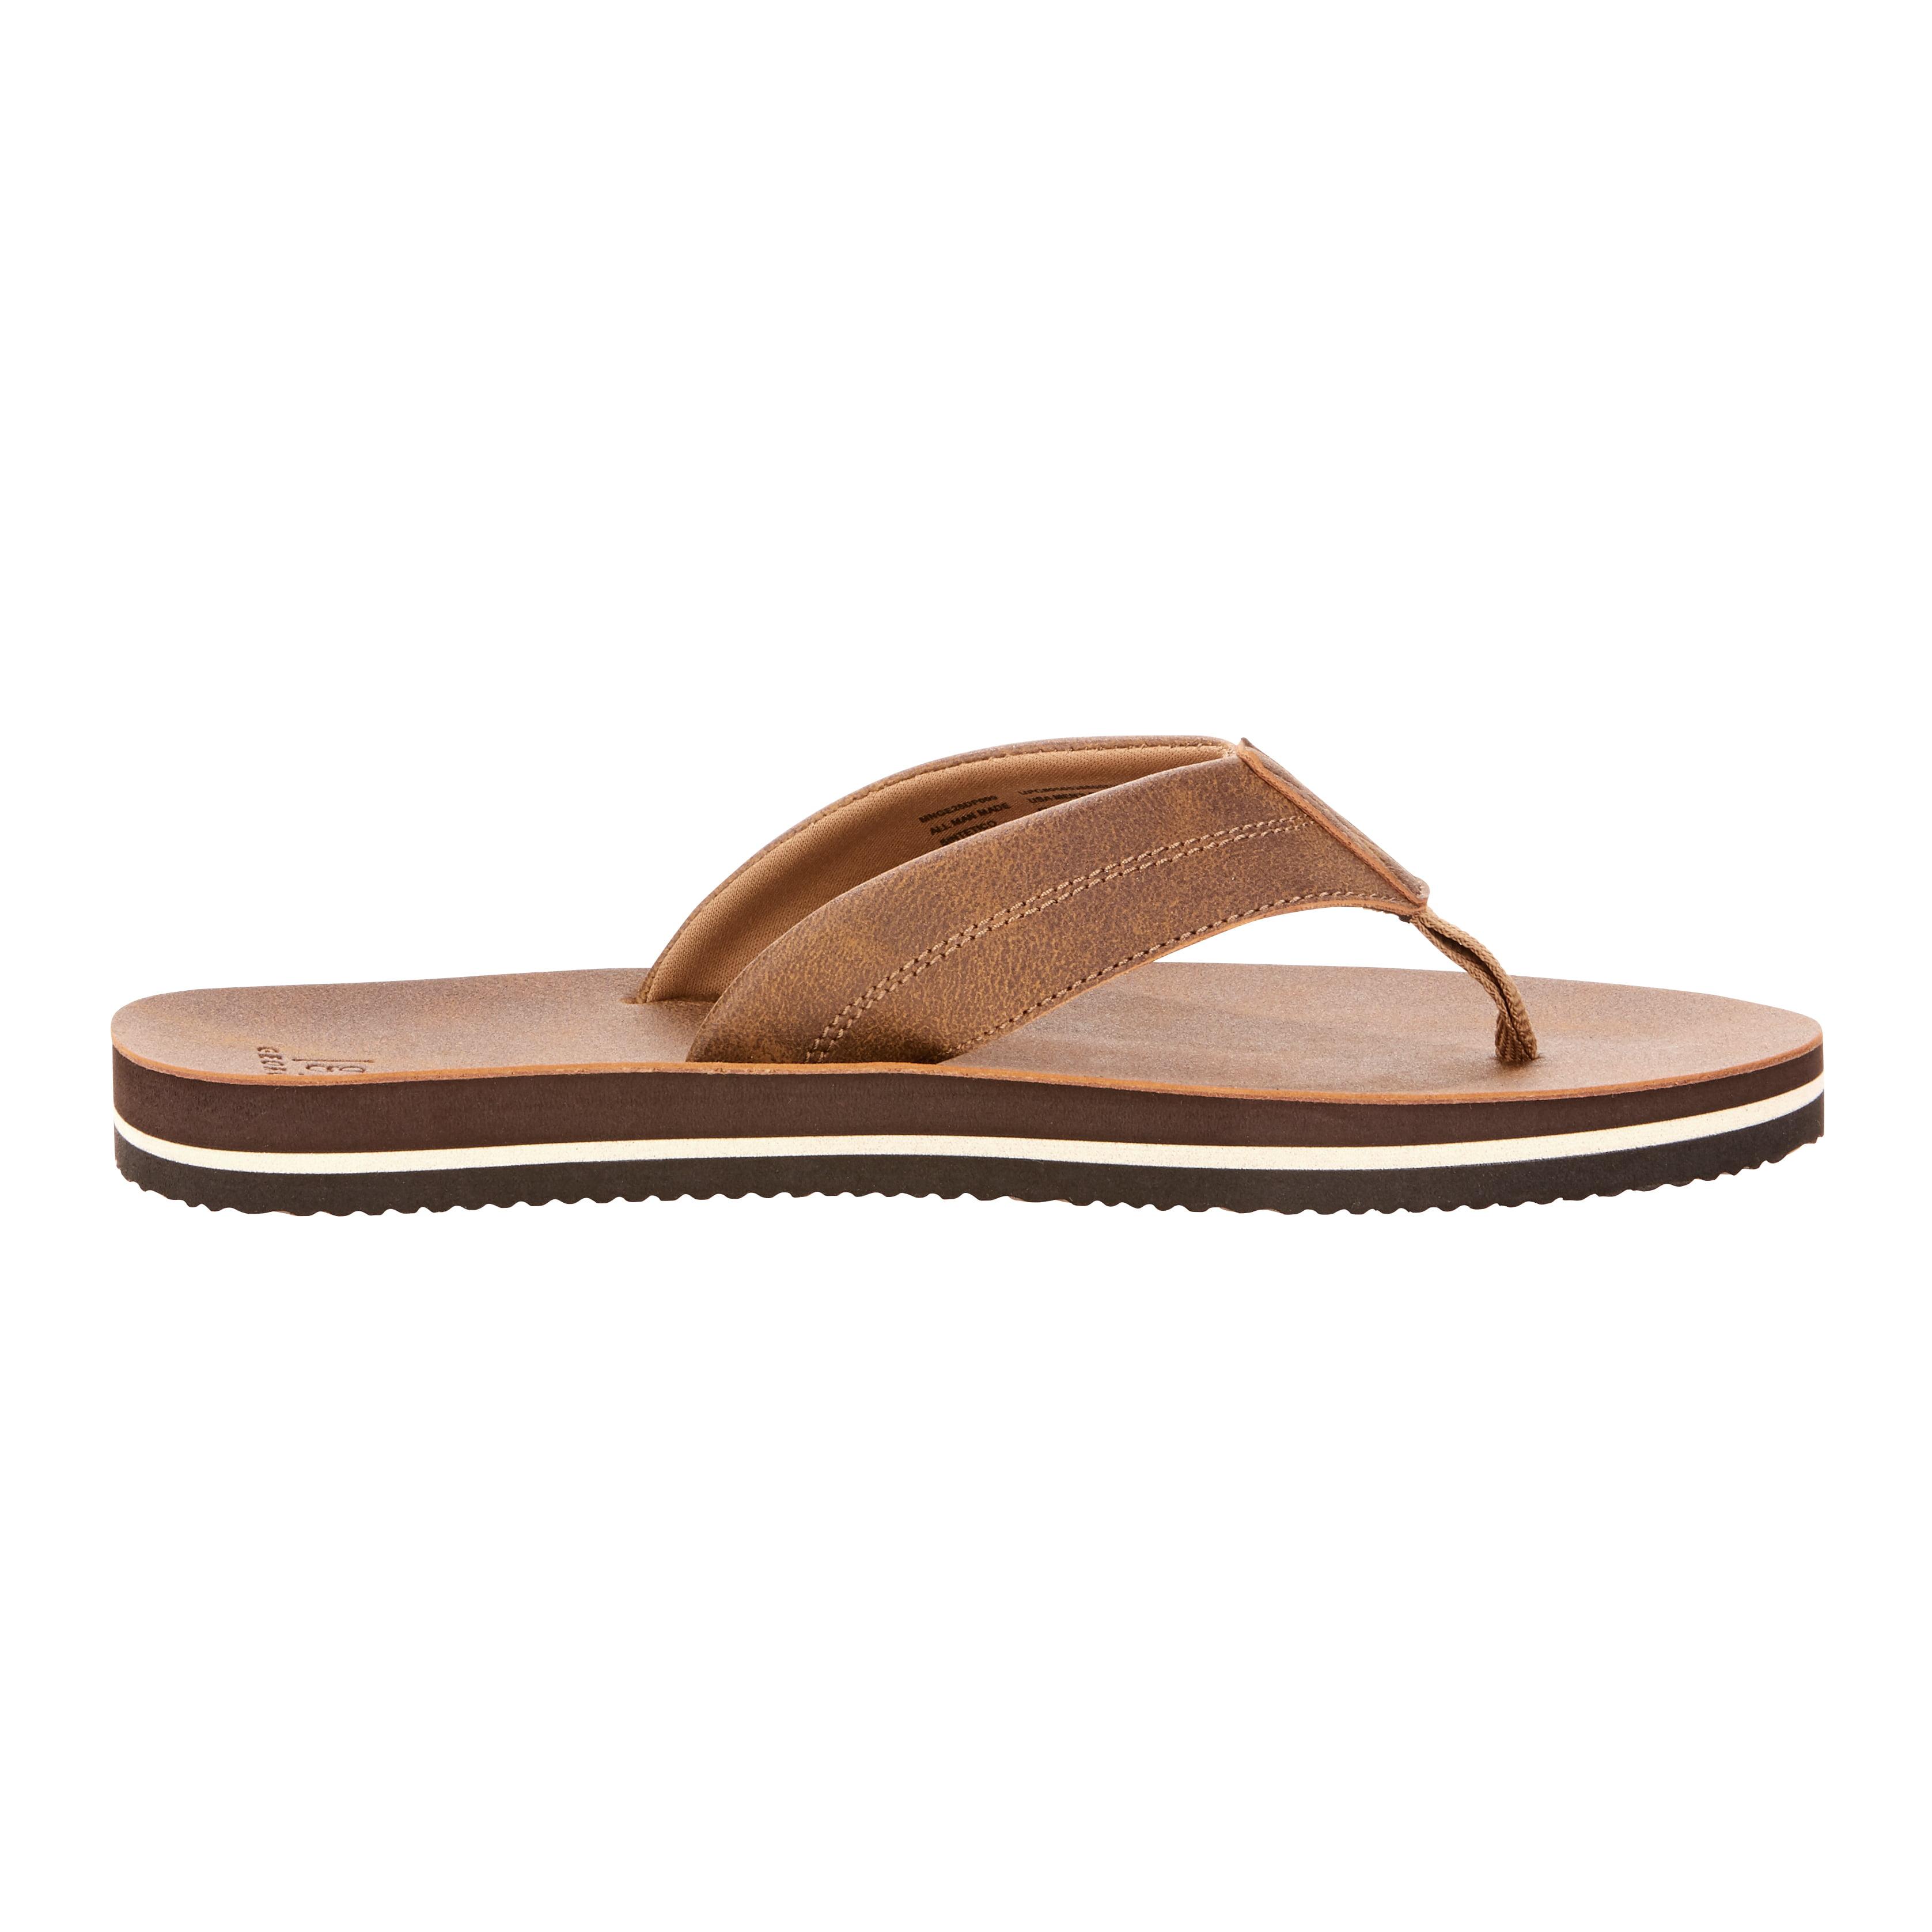 GEORGE - Men's Thong Sandal - Walmart